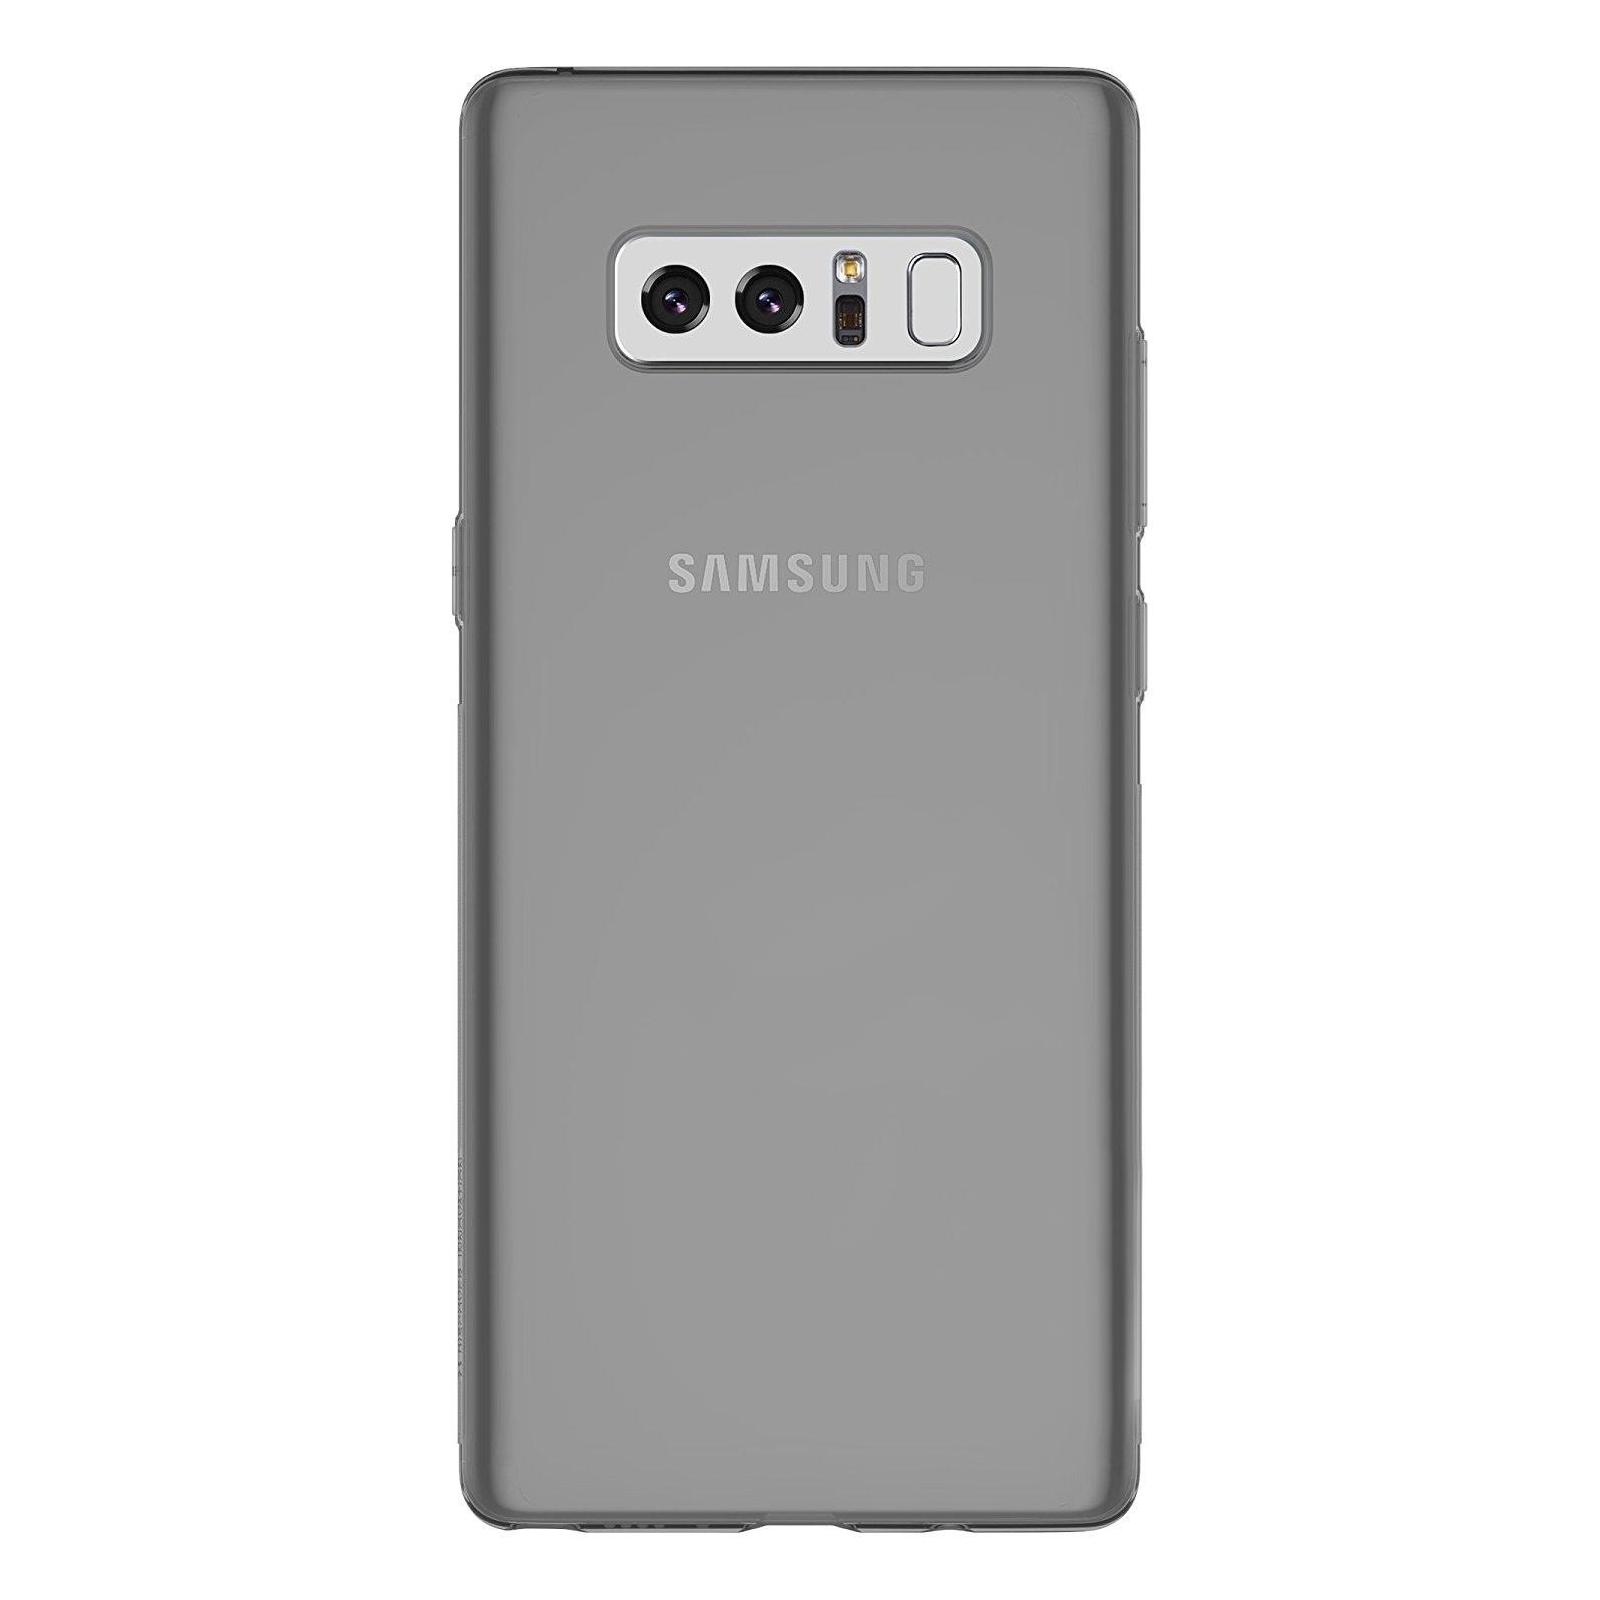 Чехол для моб. телефона SmartCase Samsung Galaxy Note 8 / SM-N950 TPU Clear (SC-GN8) изображение 8